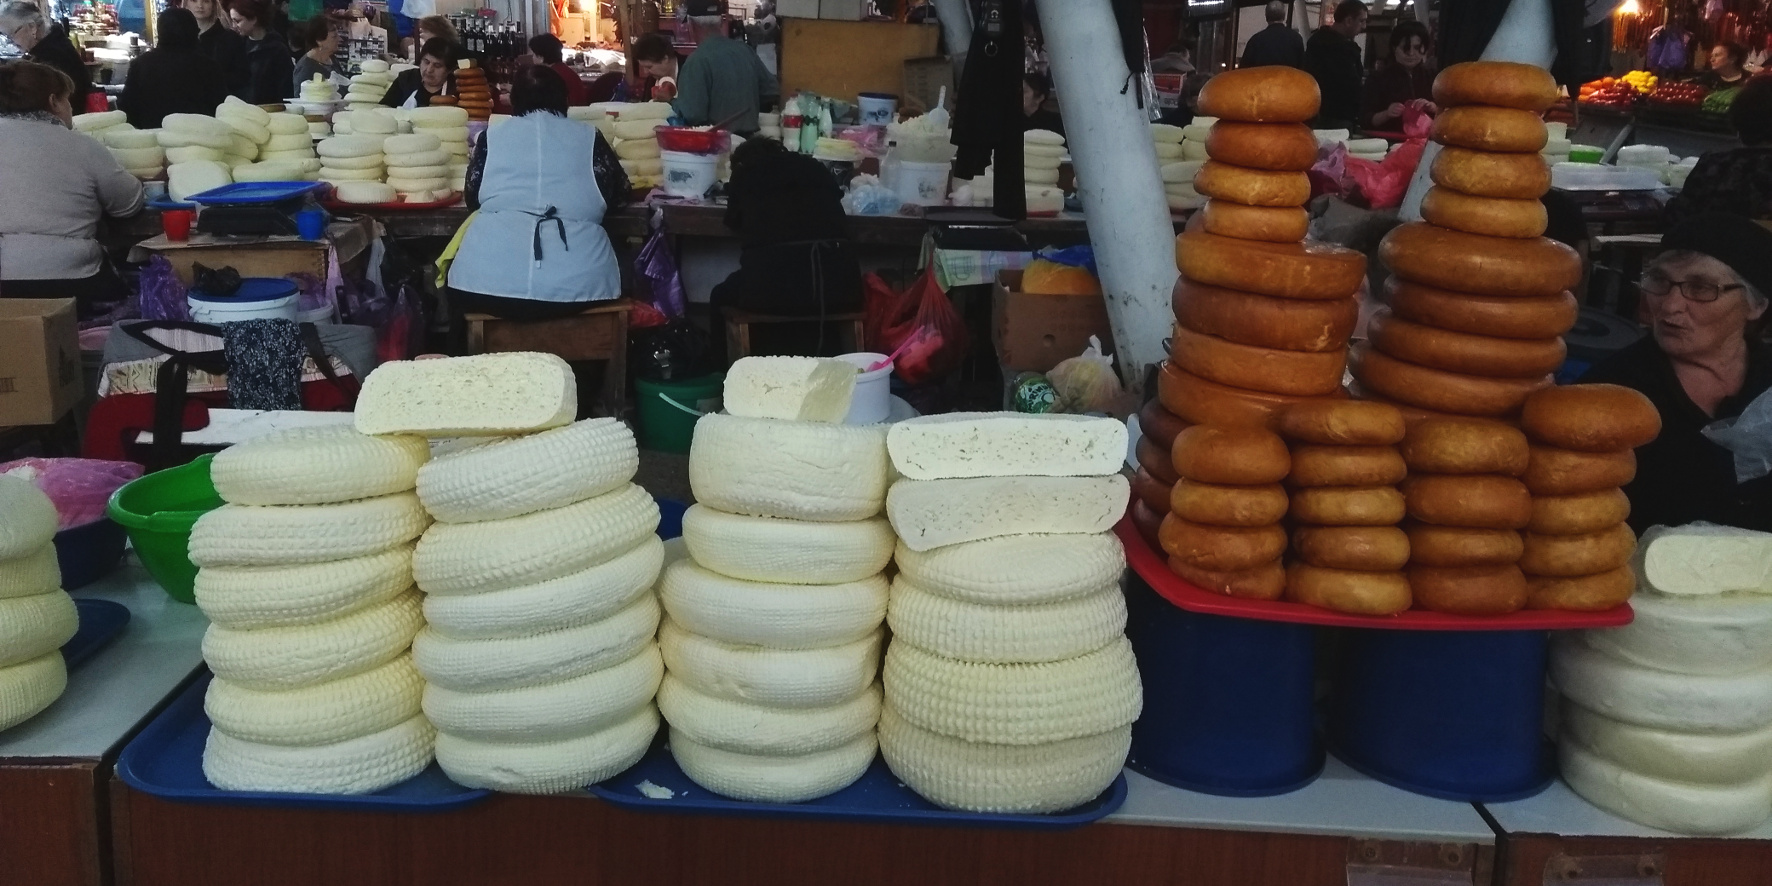 Georgien Spezialität kulinarisches Souvenir Käse (c) www.JaegerDesVerlorenenSchmatzes.de